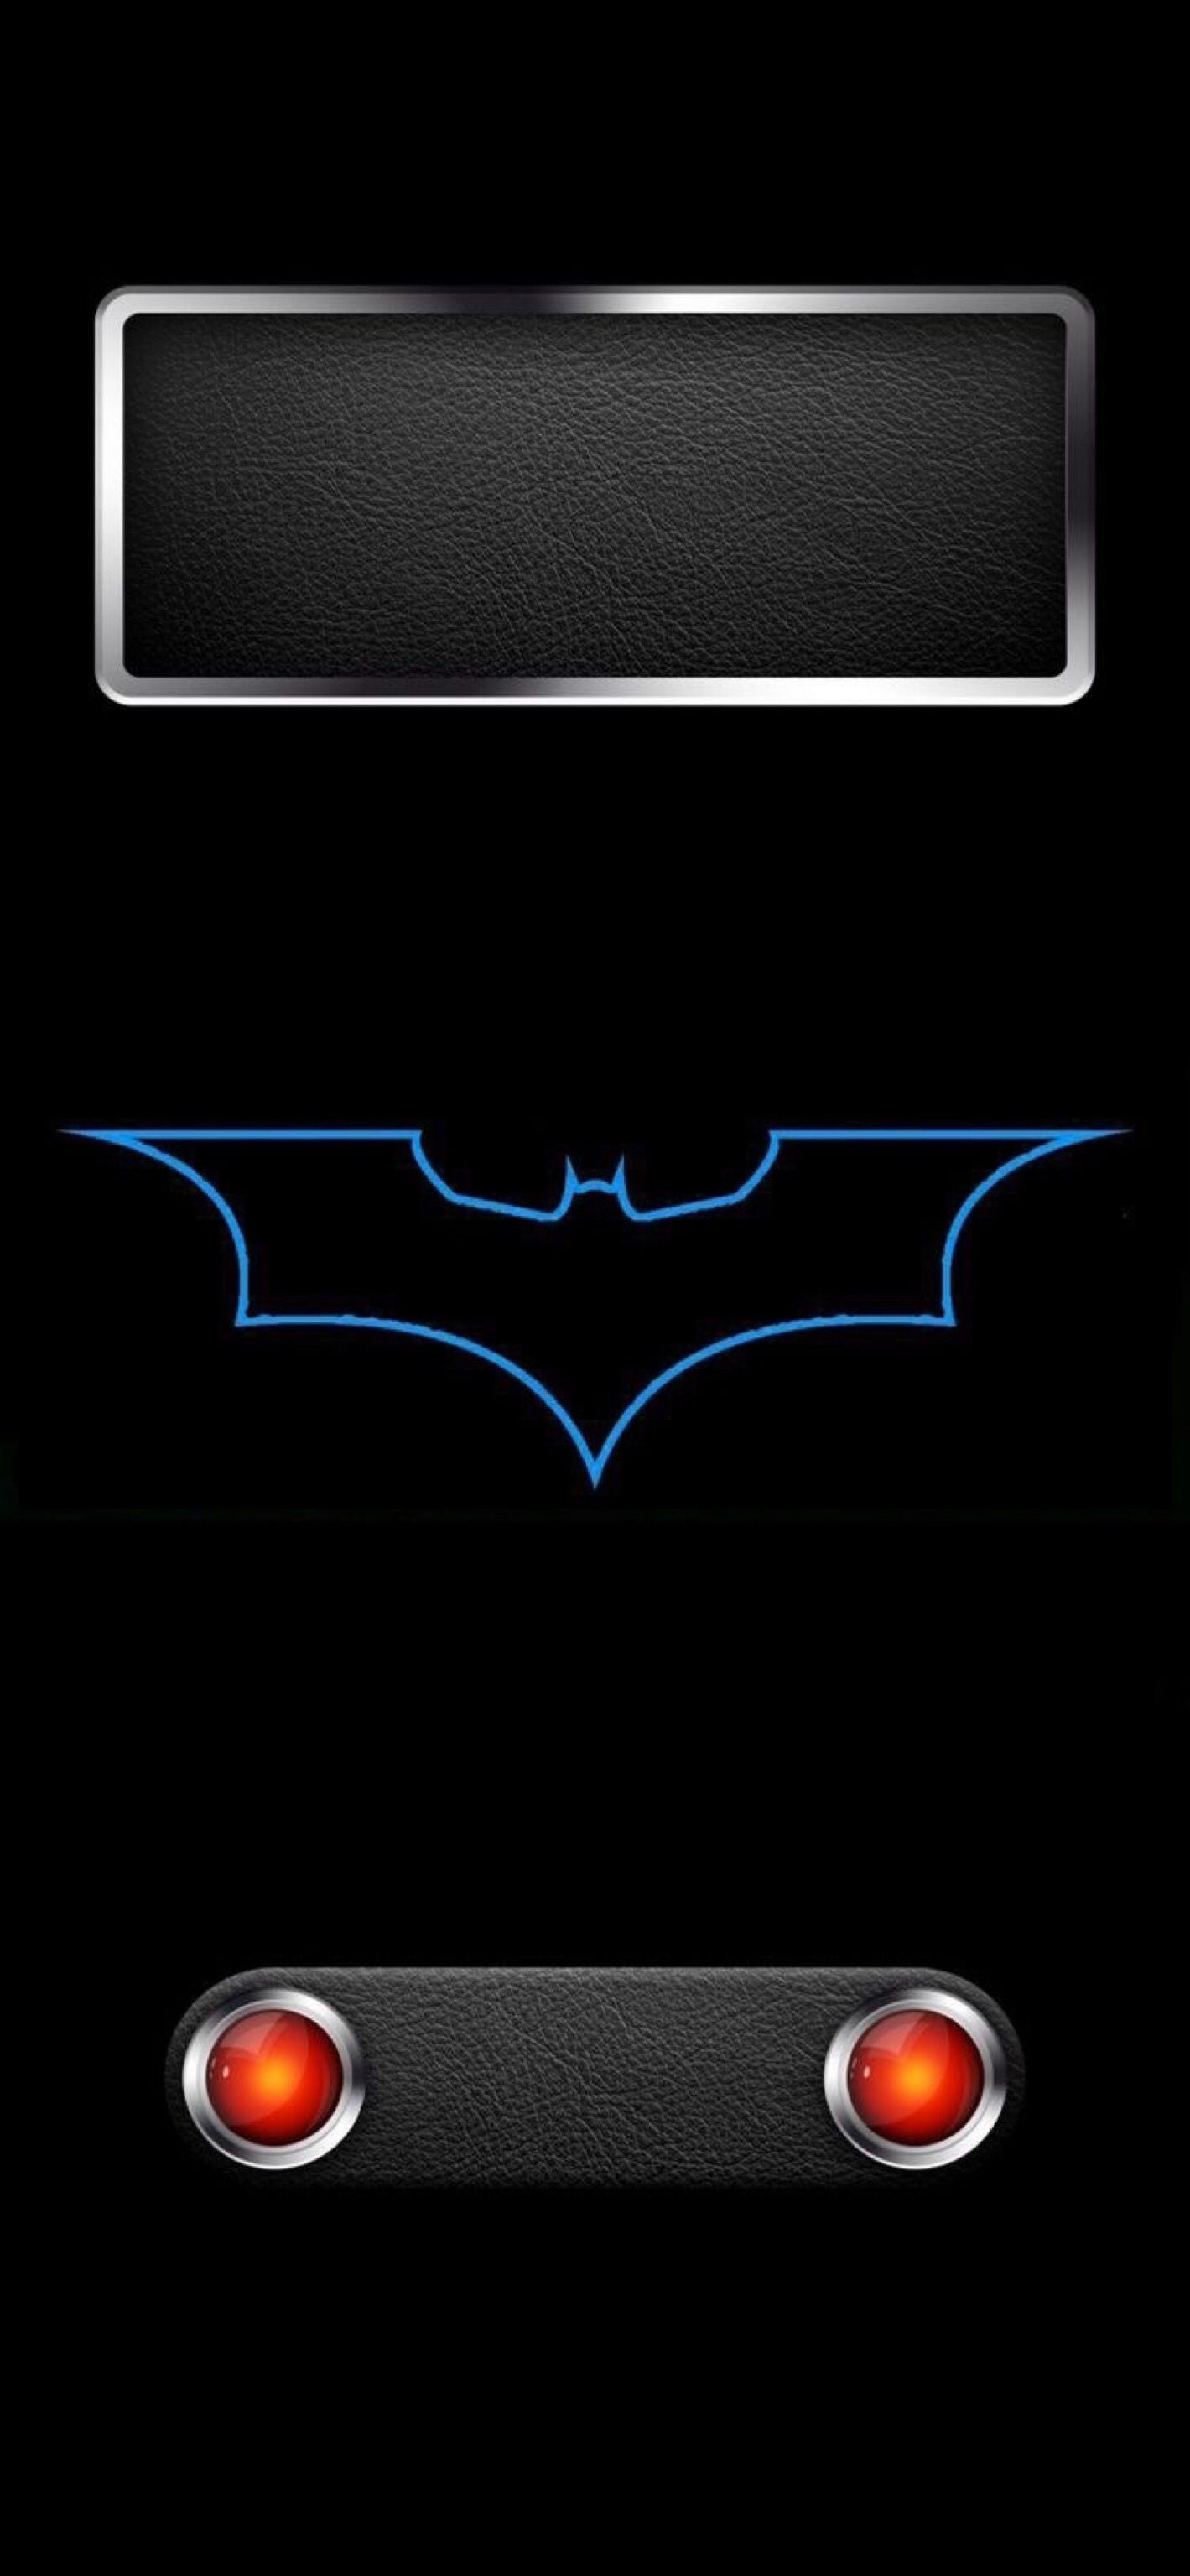 Wallpaper Iphone X Batman 1 Iphone Wallpaper Wallpaper